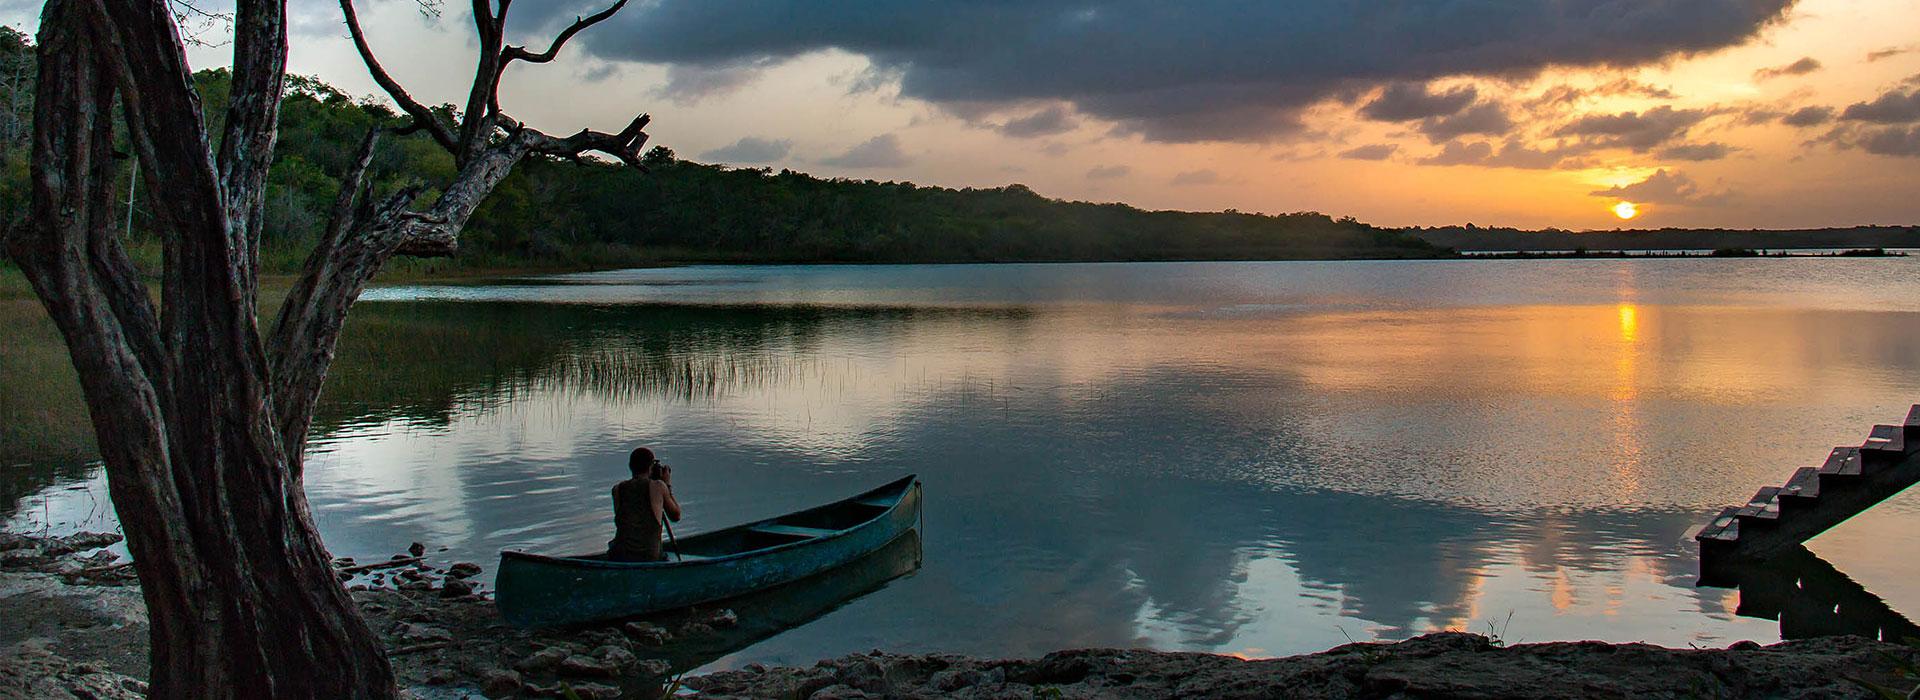 Virgin Lagoon Riviera Maya - Private Tour Photo Safari